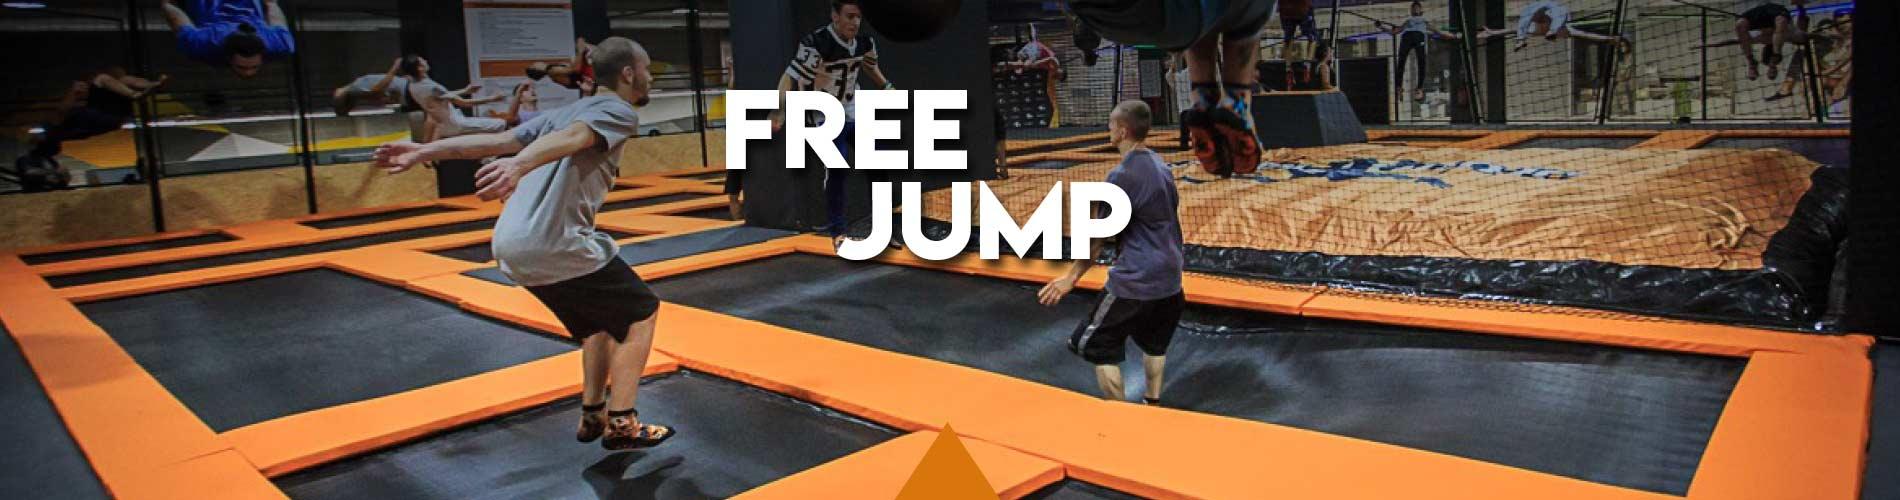 free jump urban planet jump